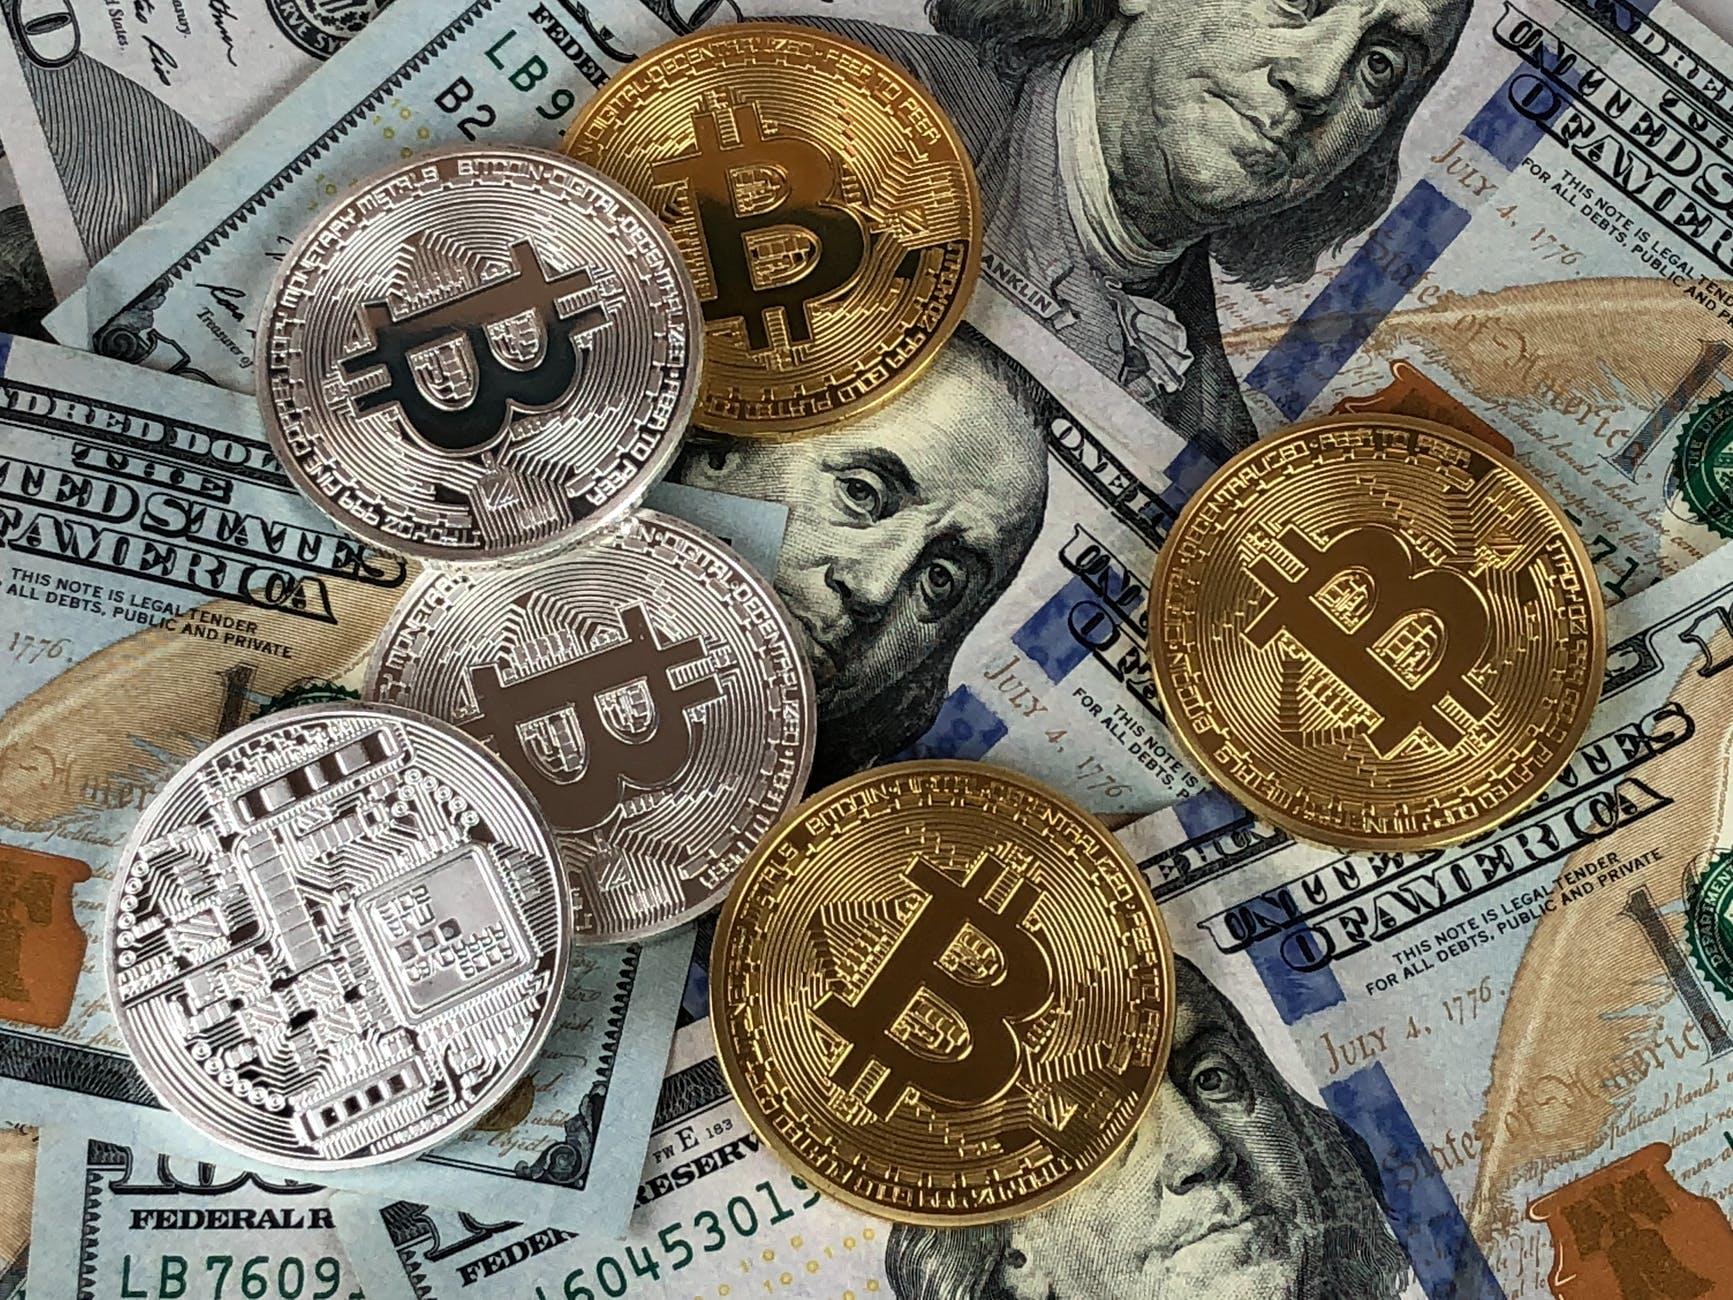 SEC reiterates futures bitcoin ETFs